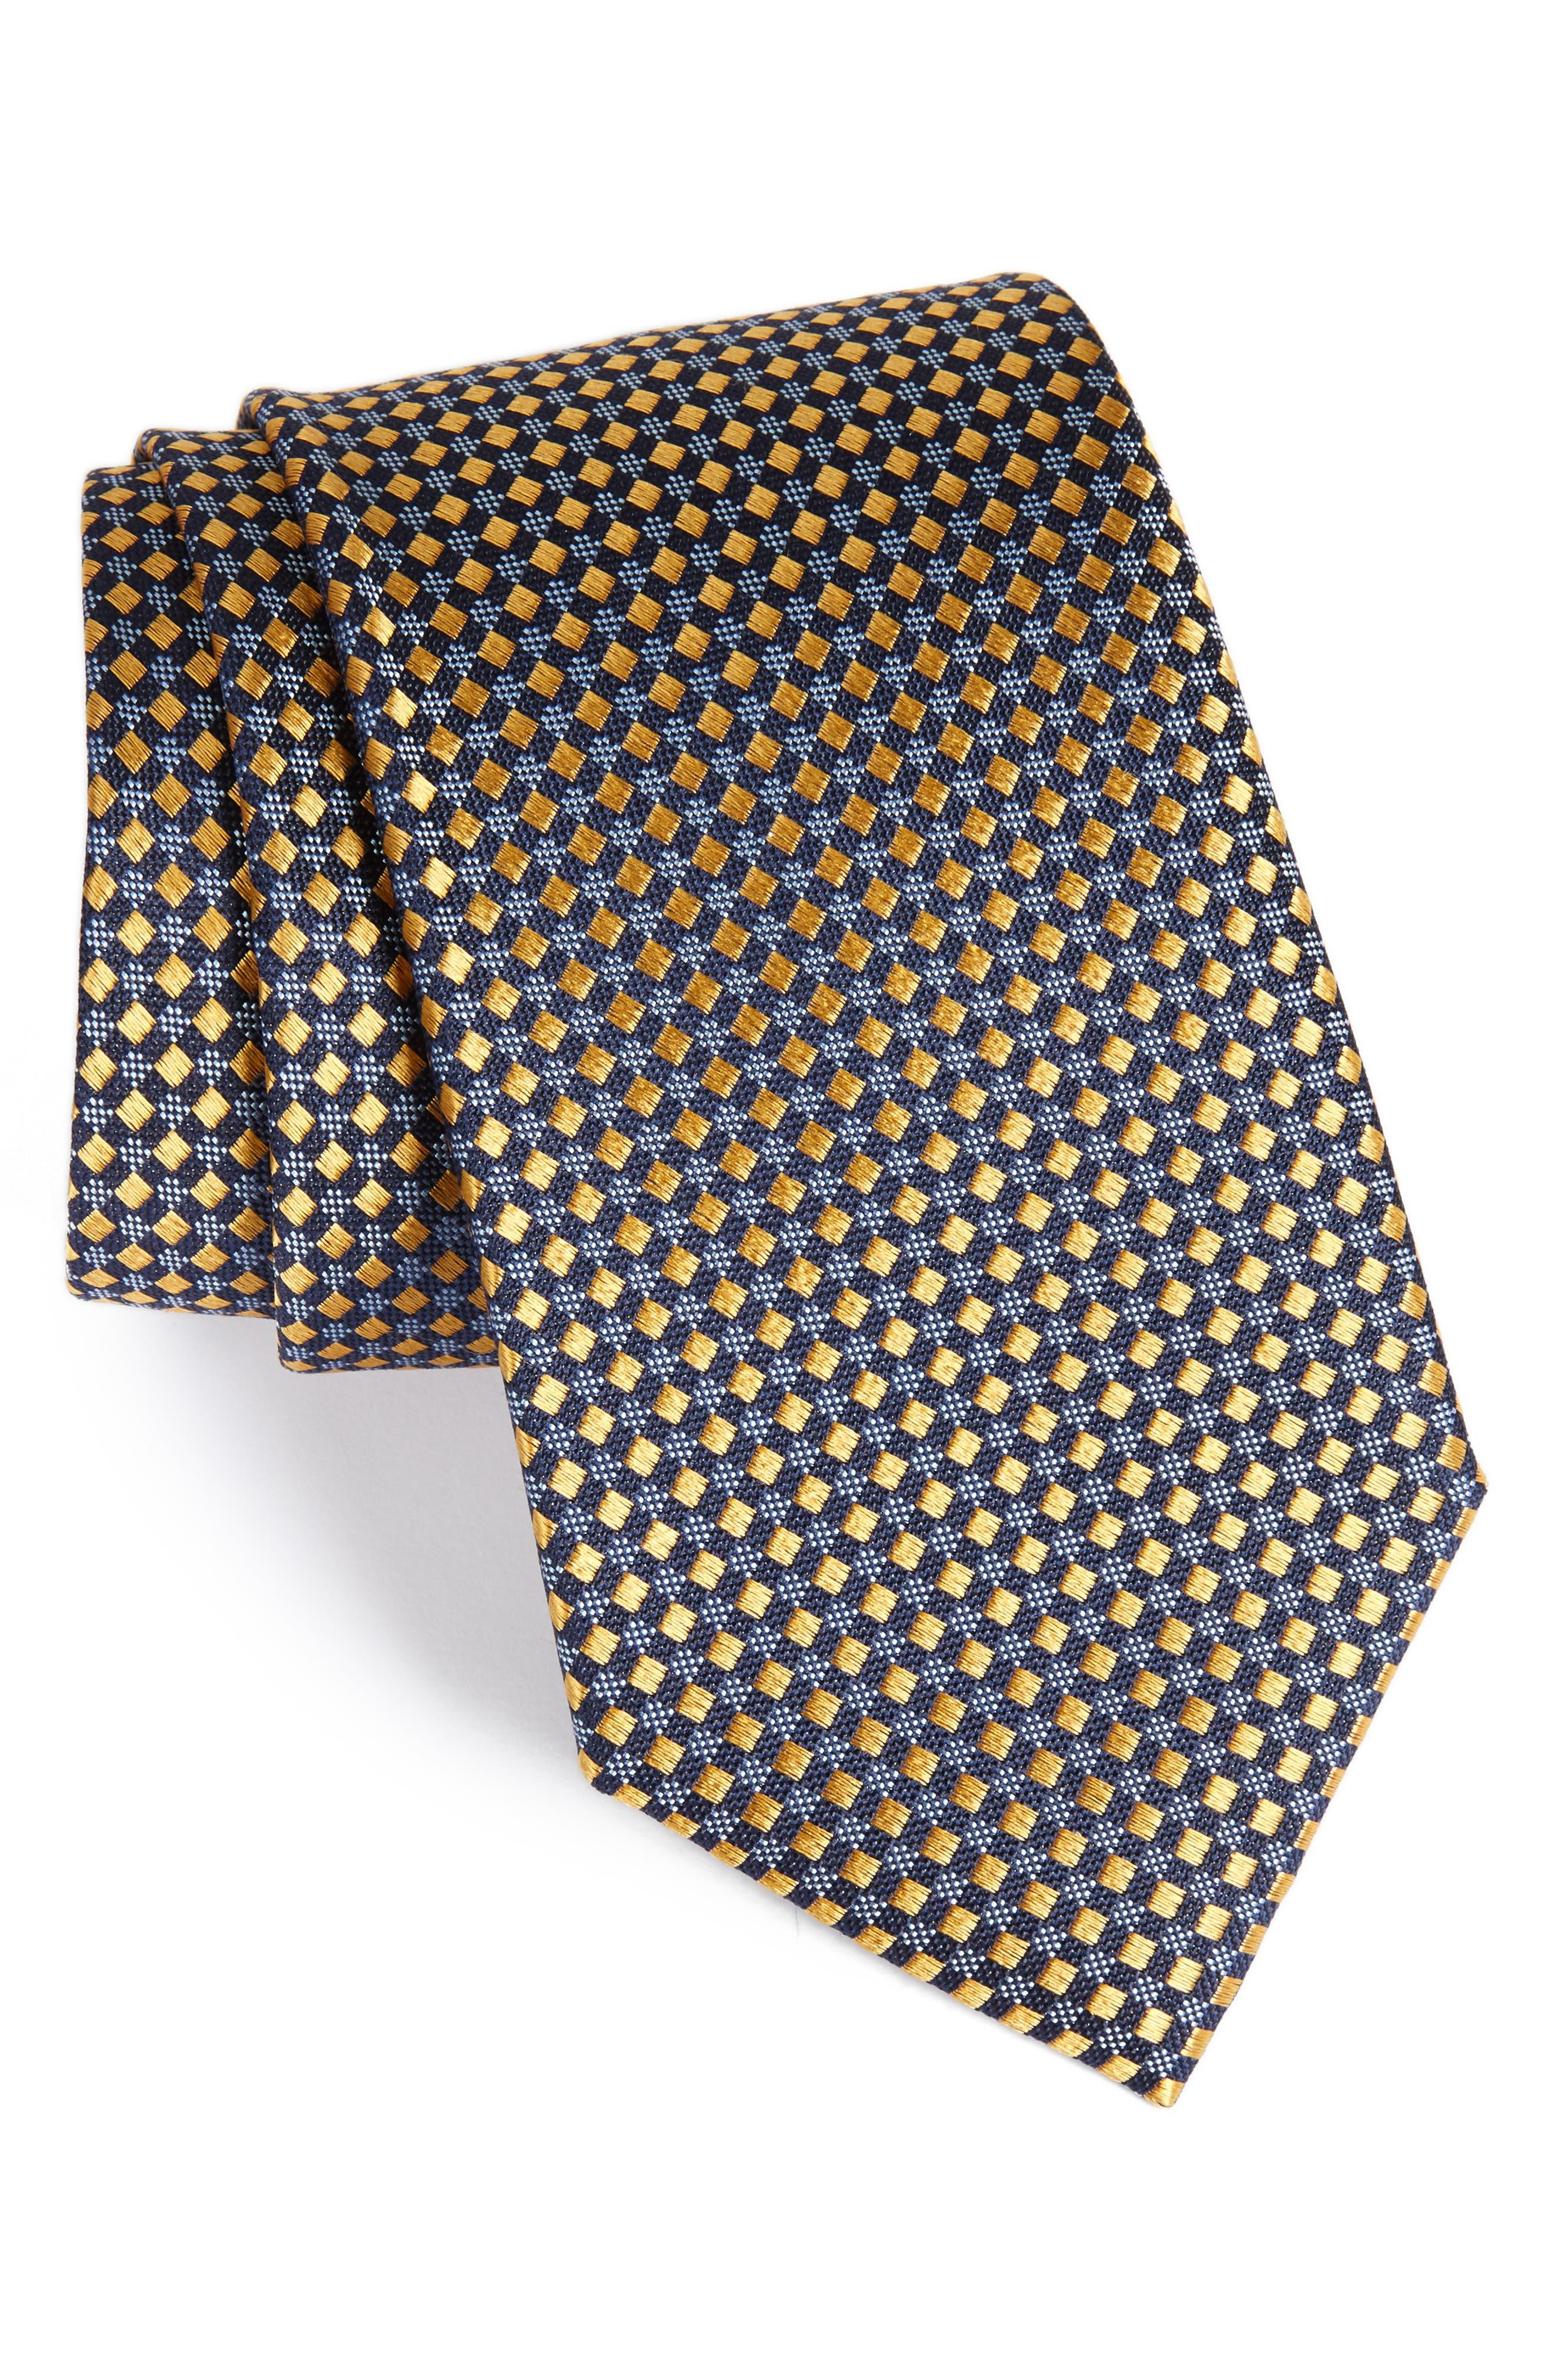 Alternate Image 1 Selected - Nordstrom Men's Shop Geometric Silk Tie (X-Long)